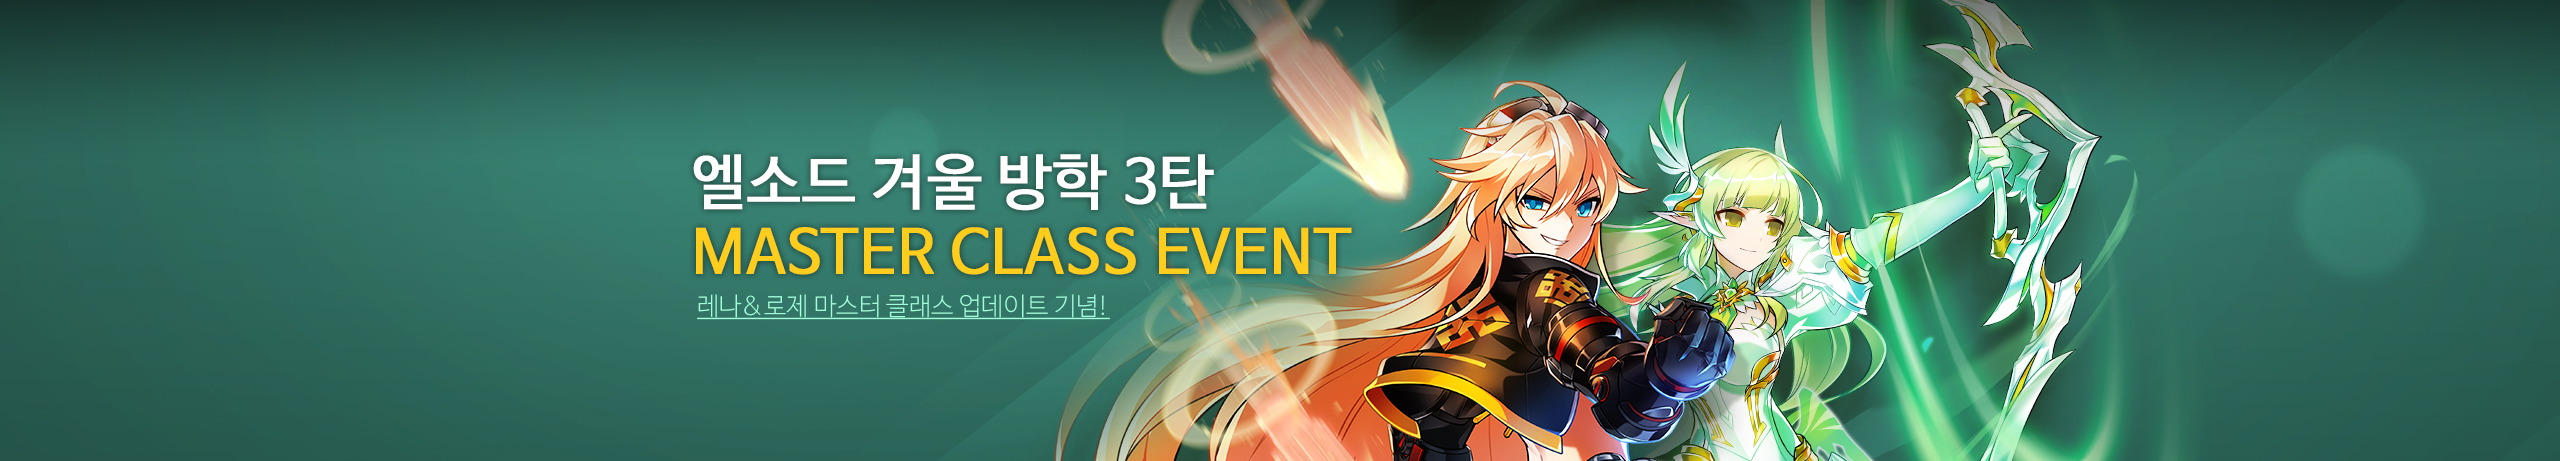 MASTER CLASS EVENT - 3차